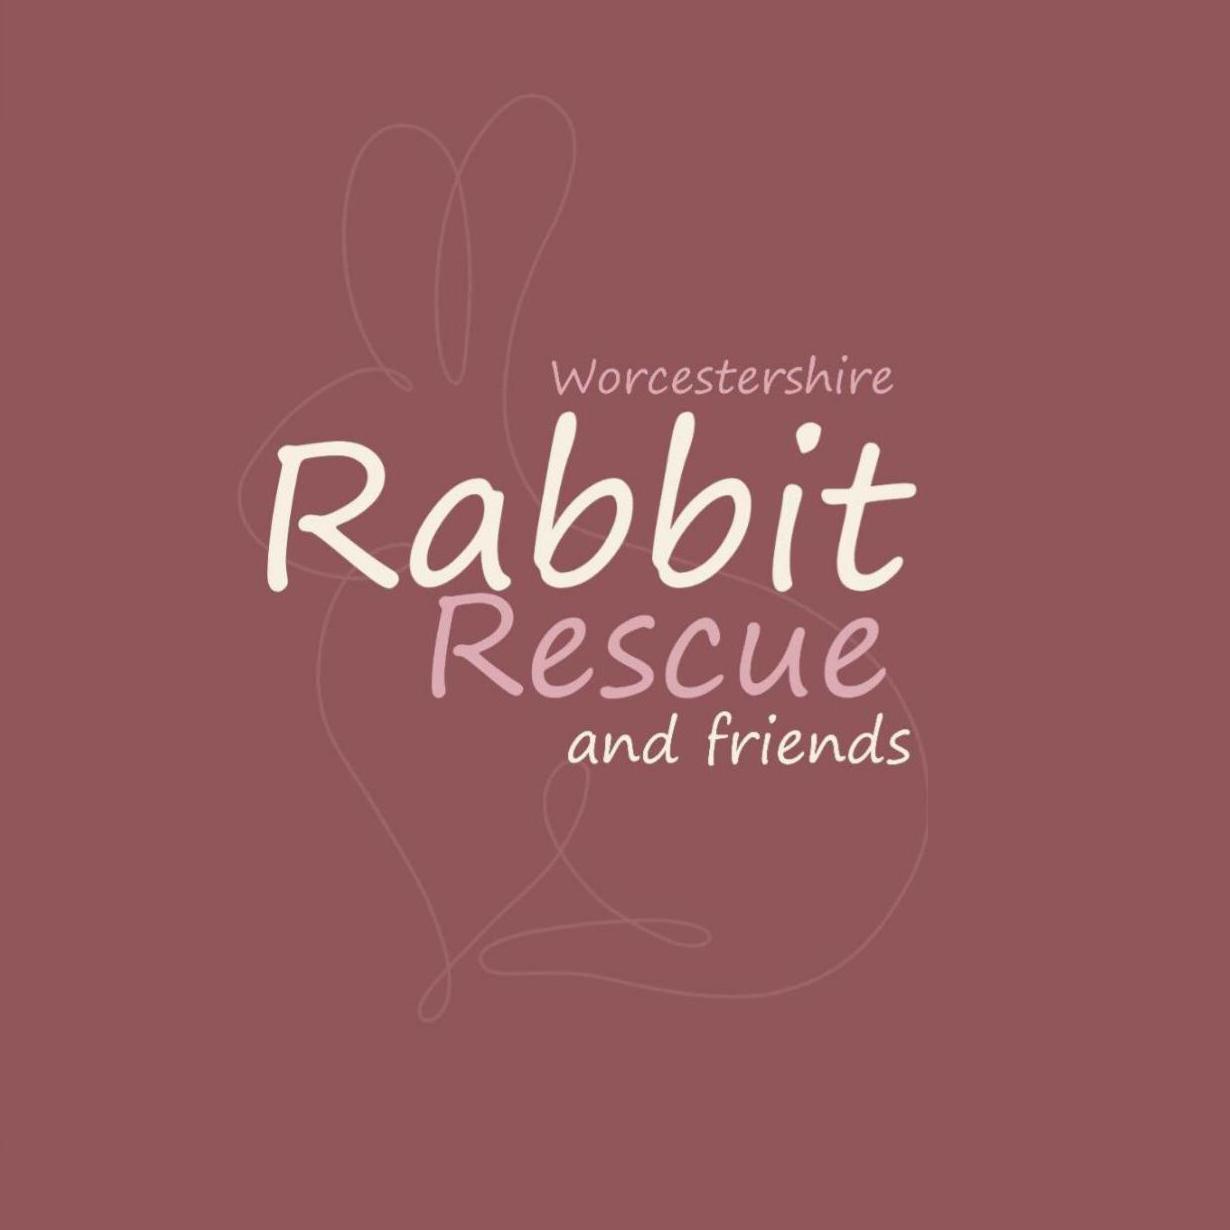 Worcestershire Rabbit Rescue and Friends, Malvern